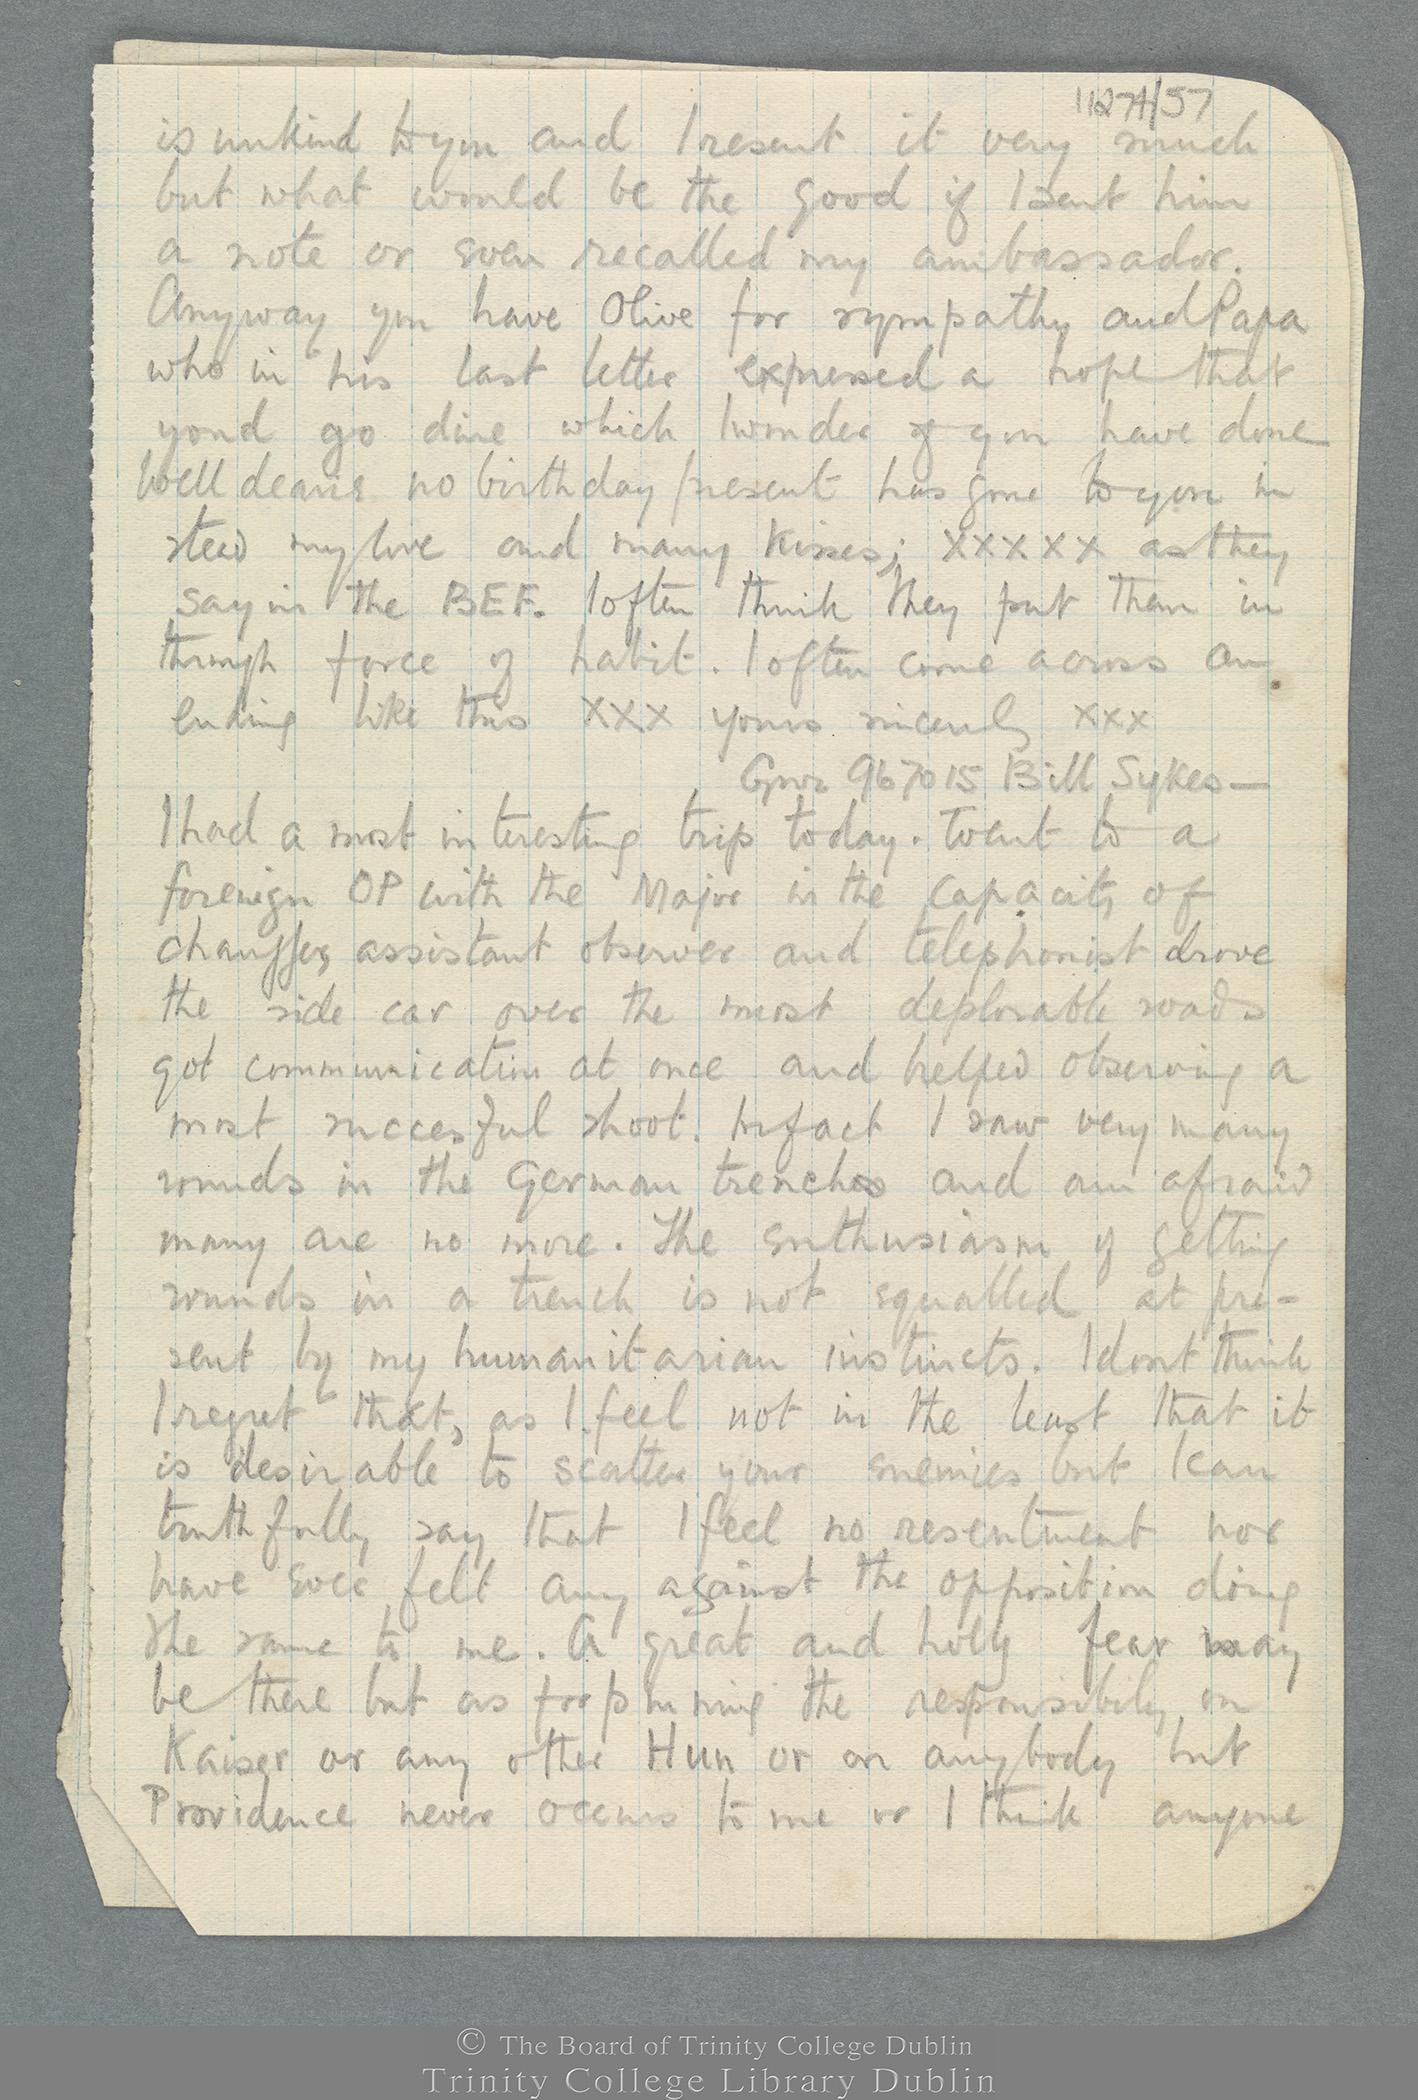 TCD MS 11274/57 folio 2 recto